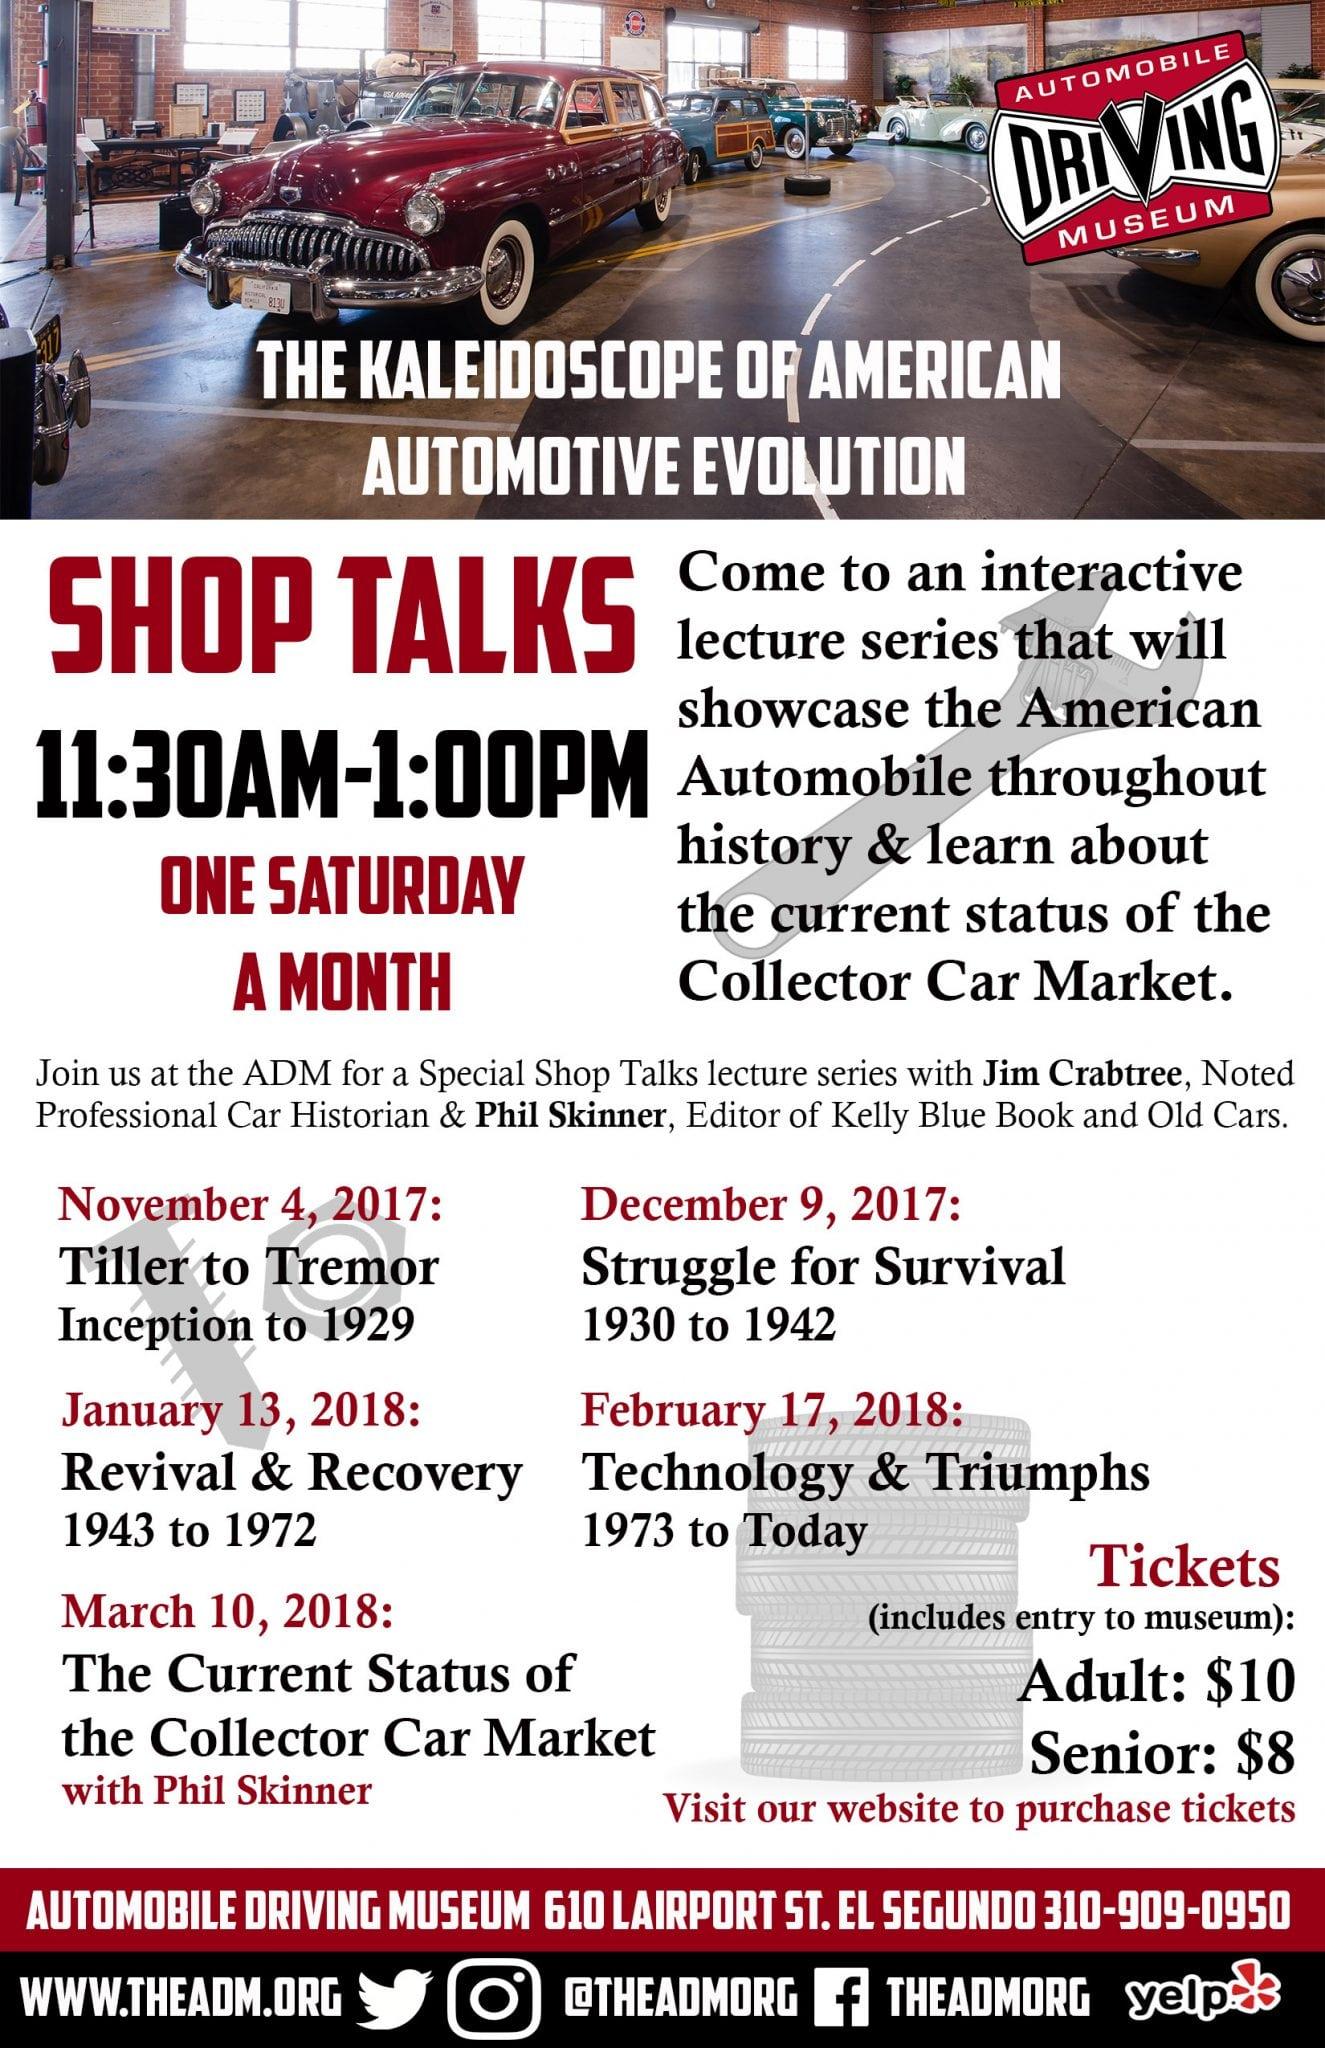 SHOP TALKS - The Kaleidoscope of American Automotive Evolution ...